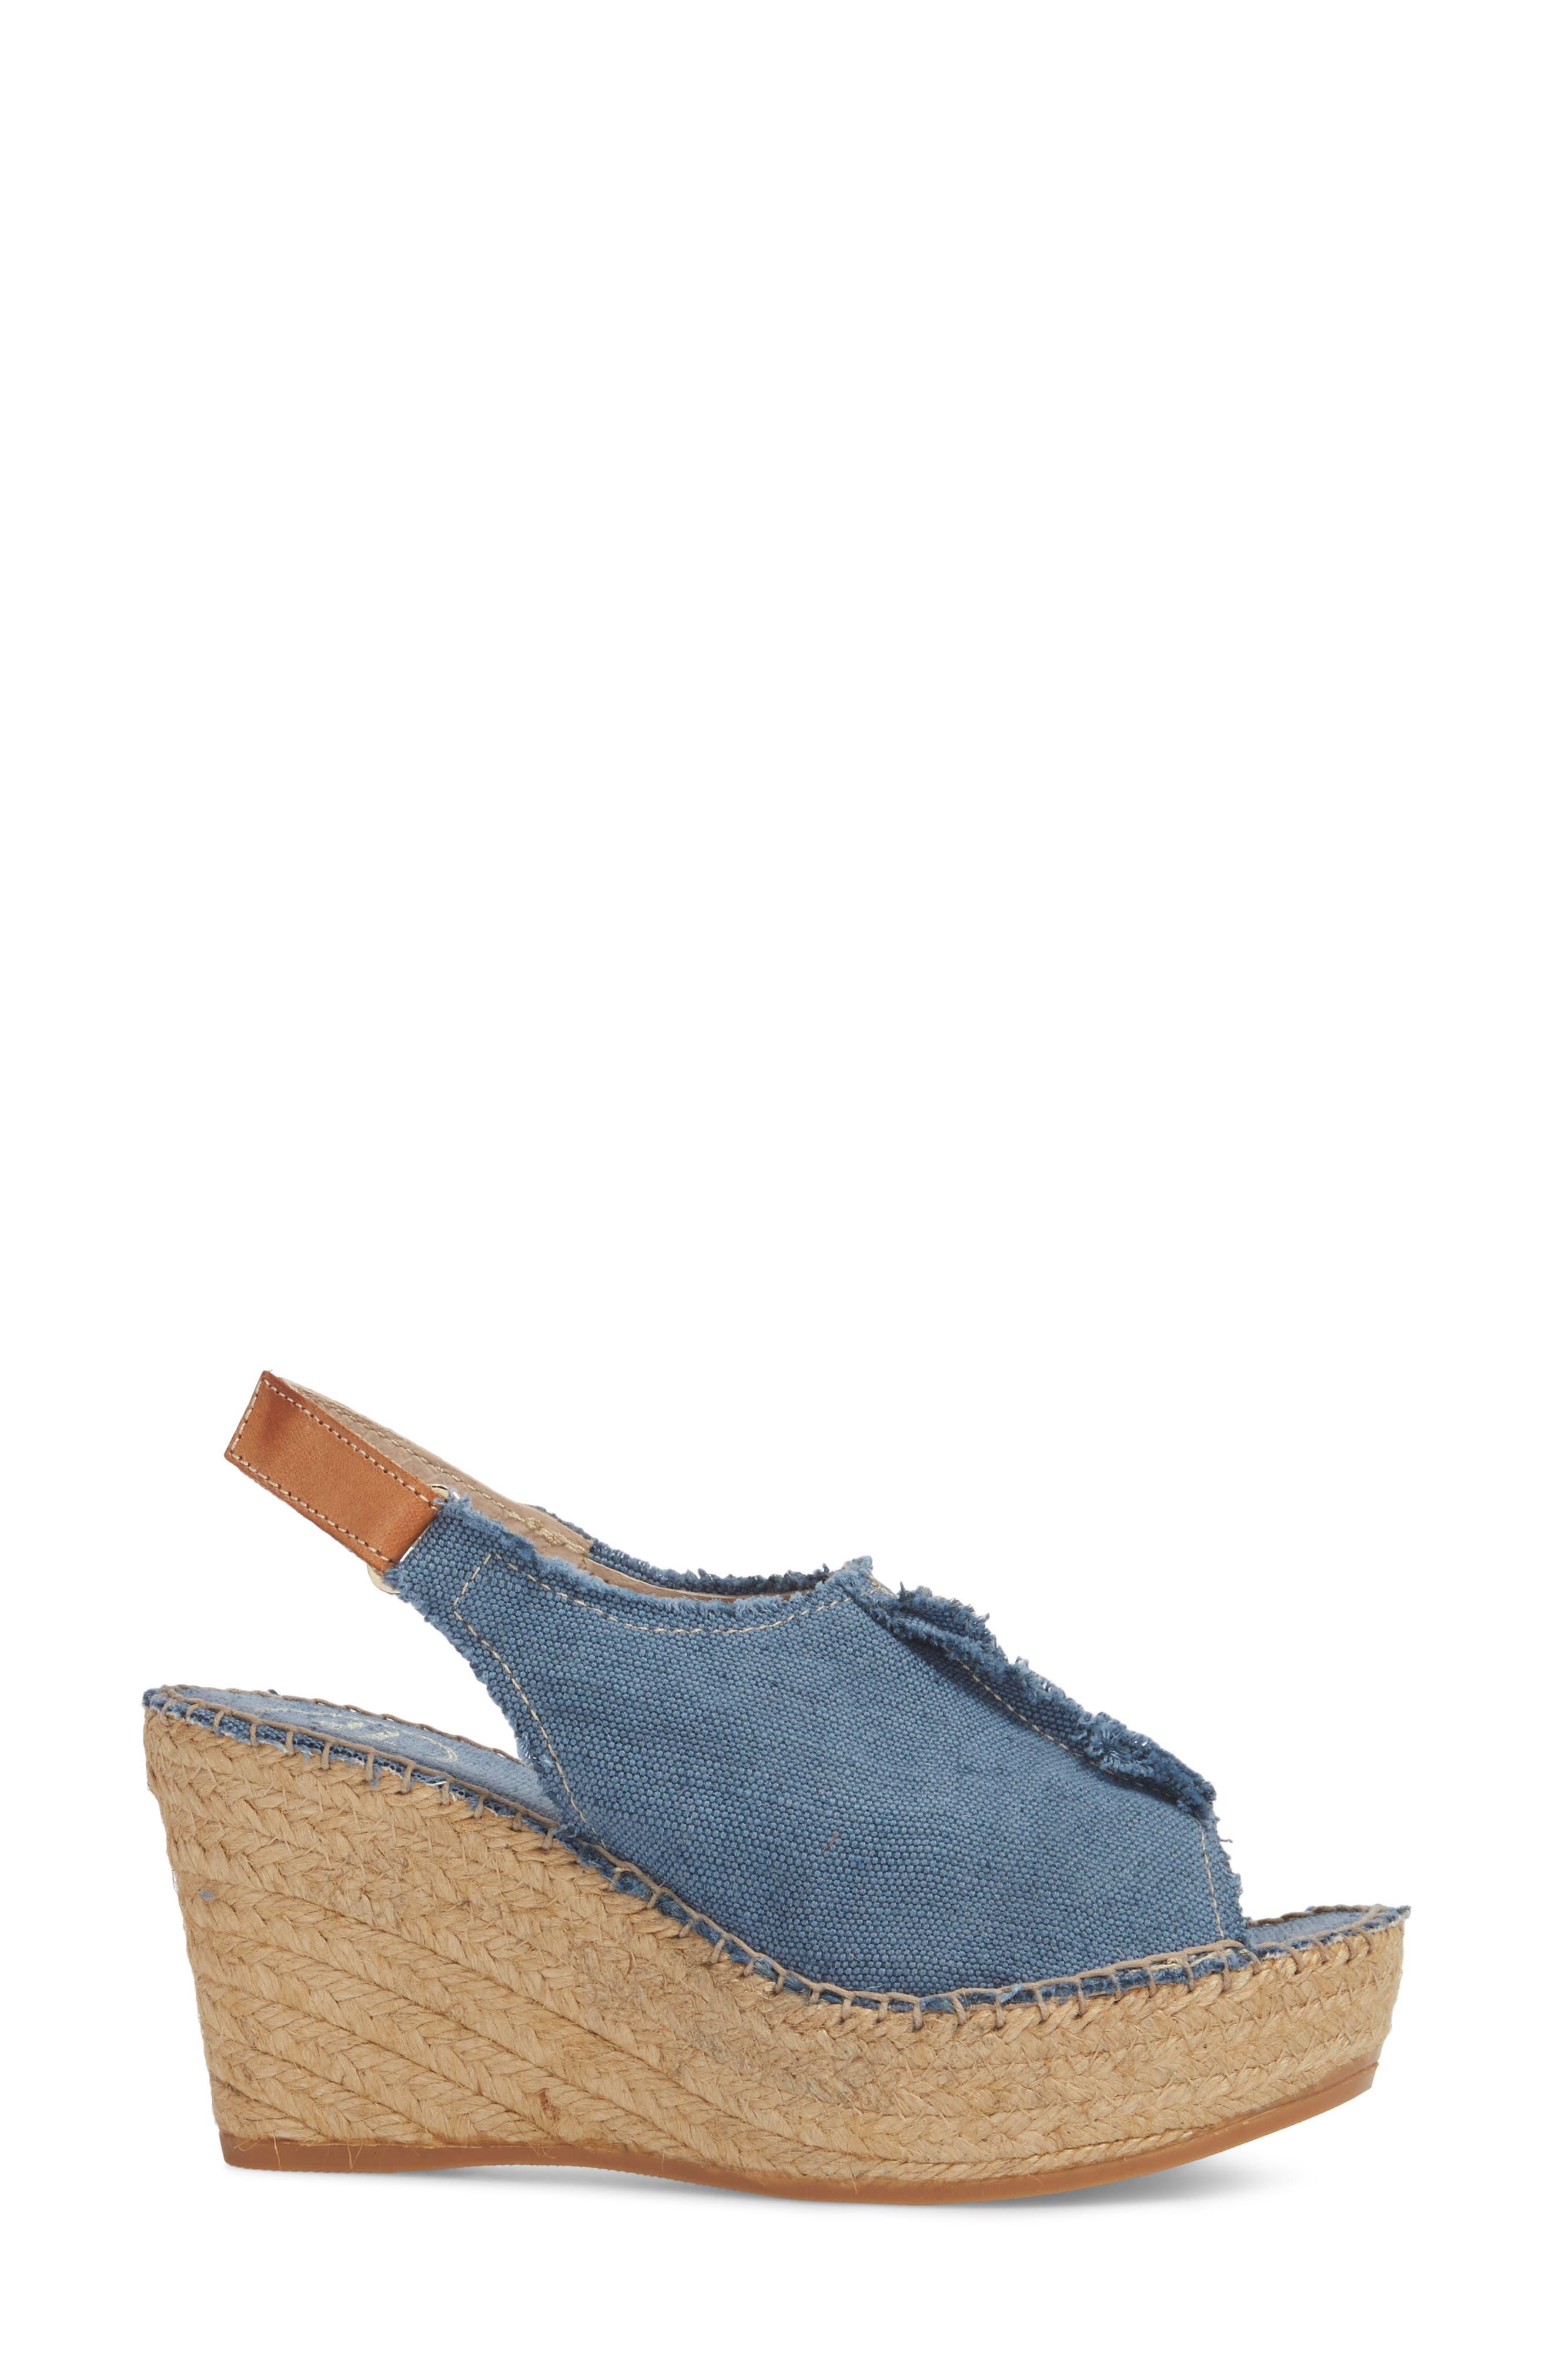 'Lugano' Espadrille Wedge Sandal,                             Alternate thumbnail 3, color,                             Blue Fabric